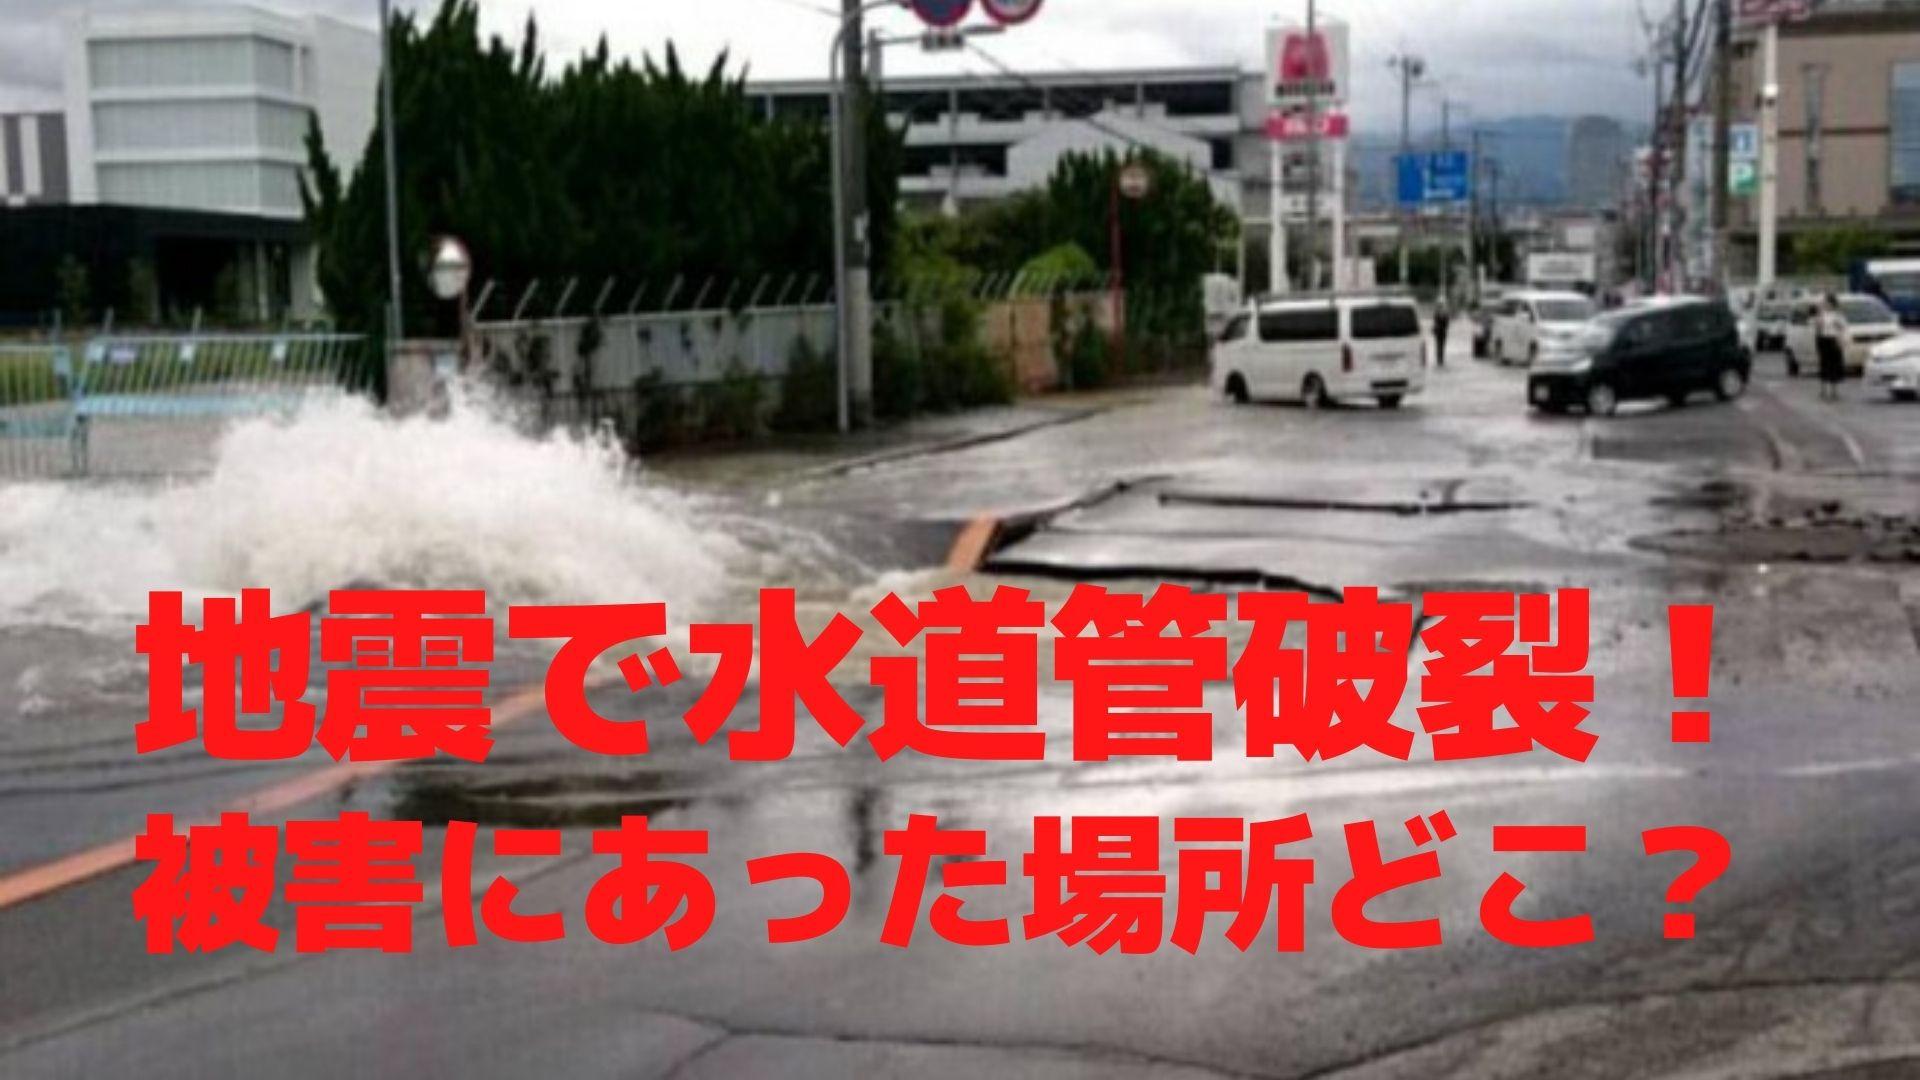 earthquake-water-pipe-rupture